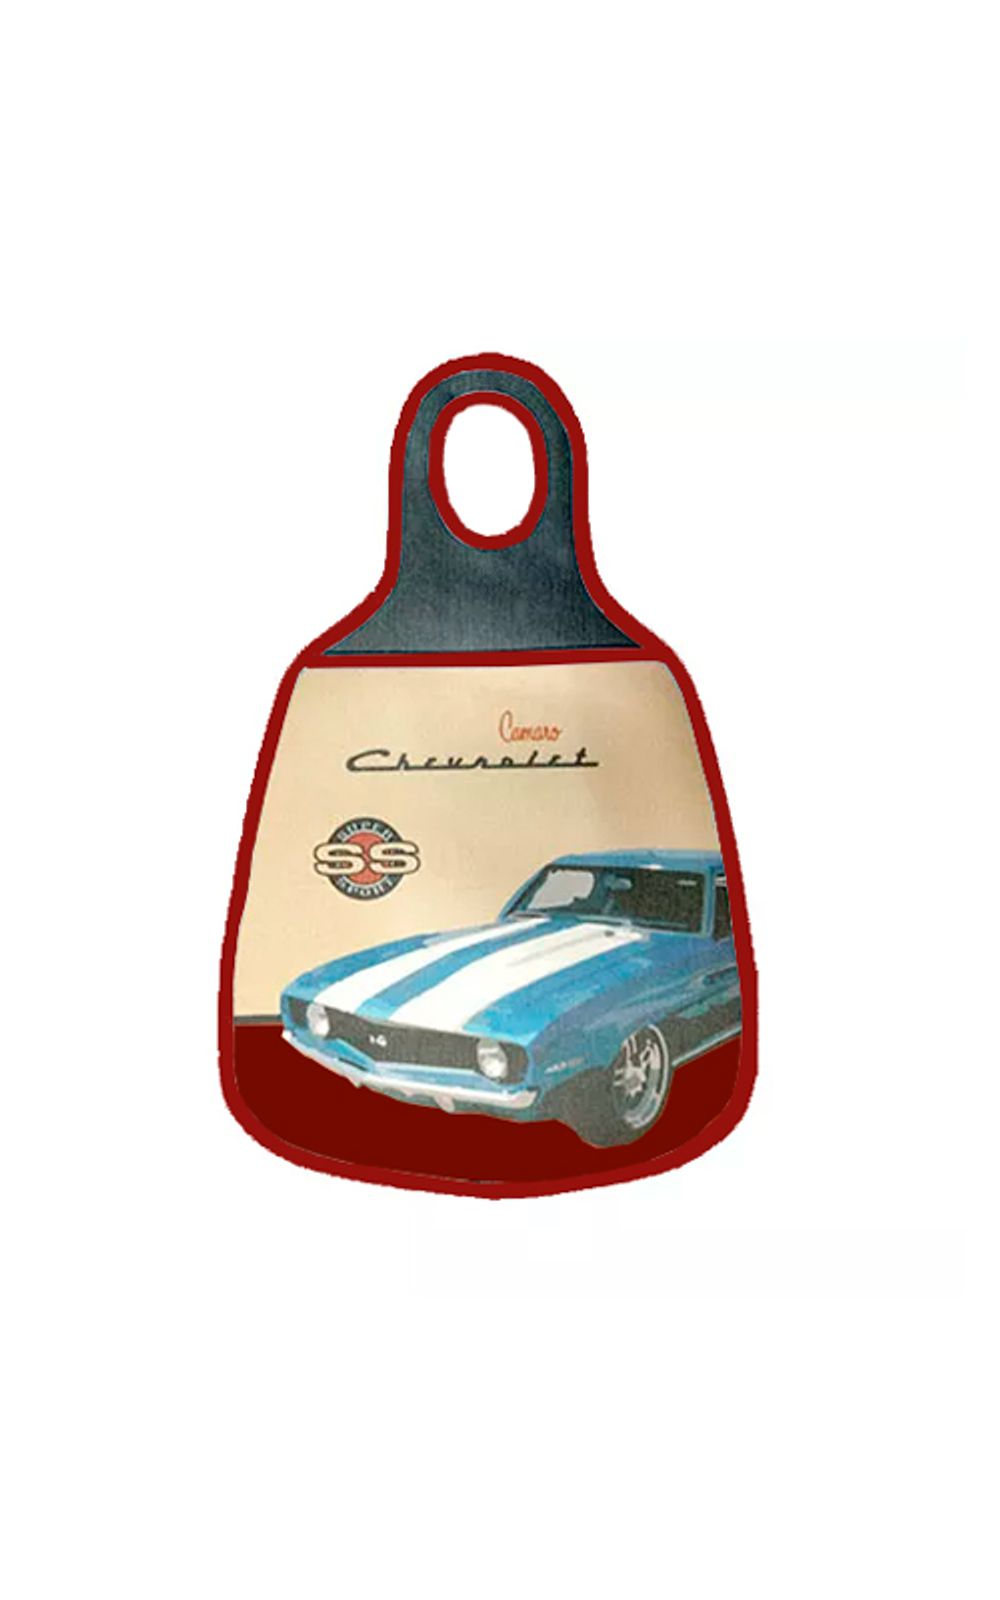 Foto 1 - Lixeira para Carro Camaro GM Chevrolet Vintage